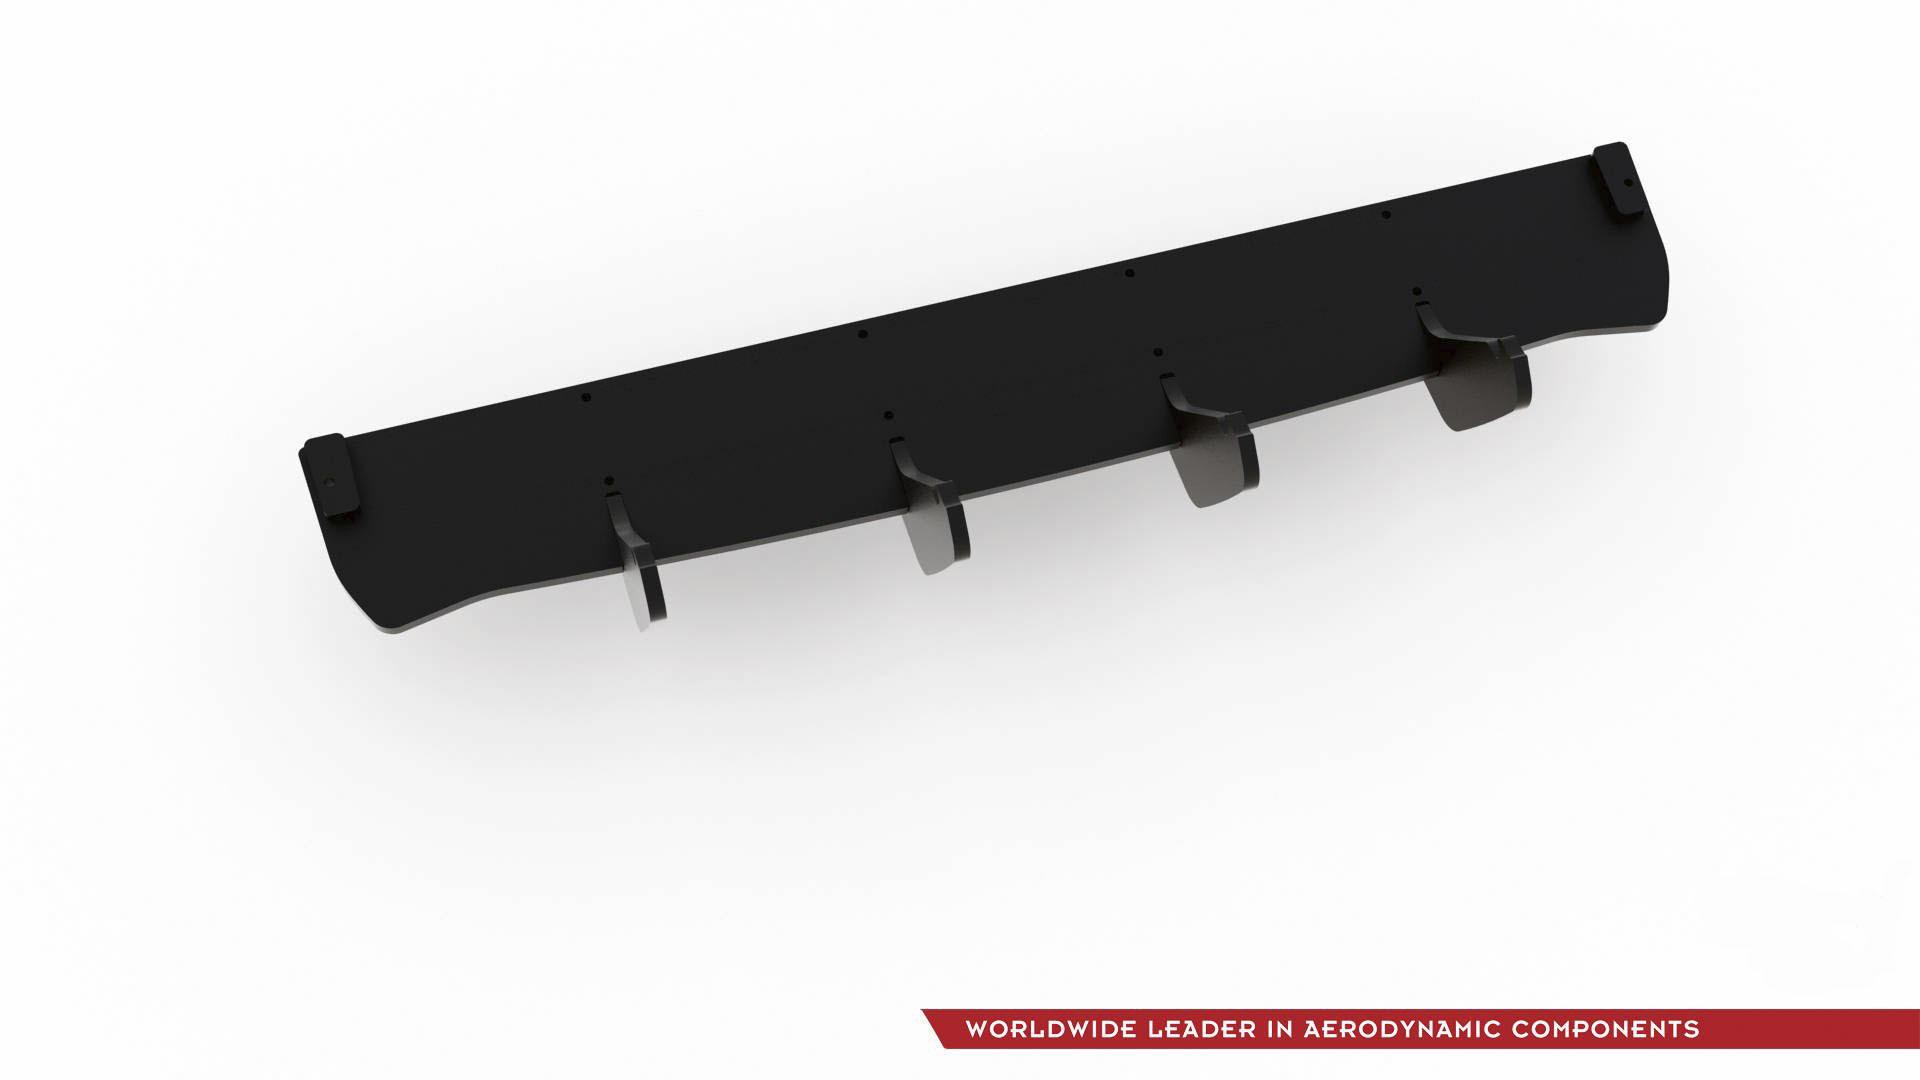 Maxton Design RACING DURABILITY REAR DIFFUSER FOR VW GOLF 7 GTI TCR latest model